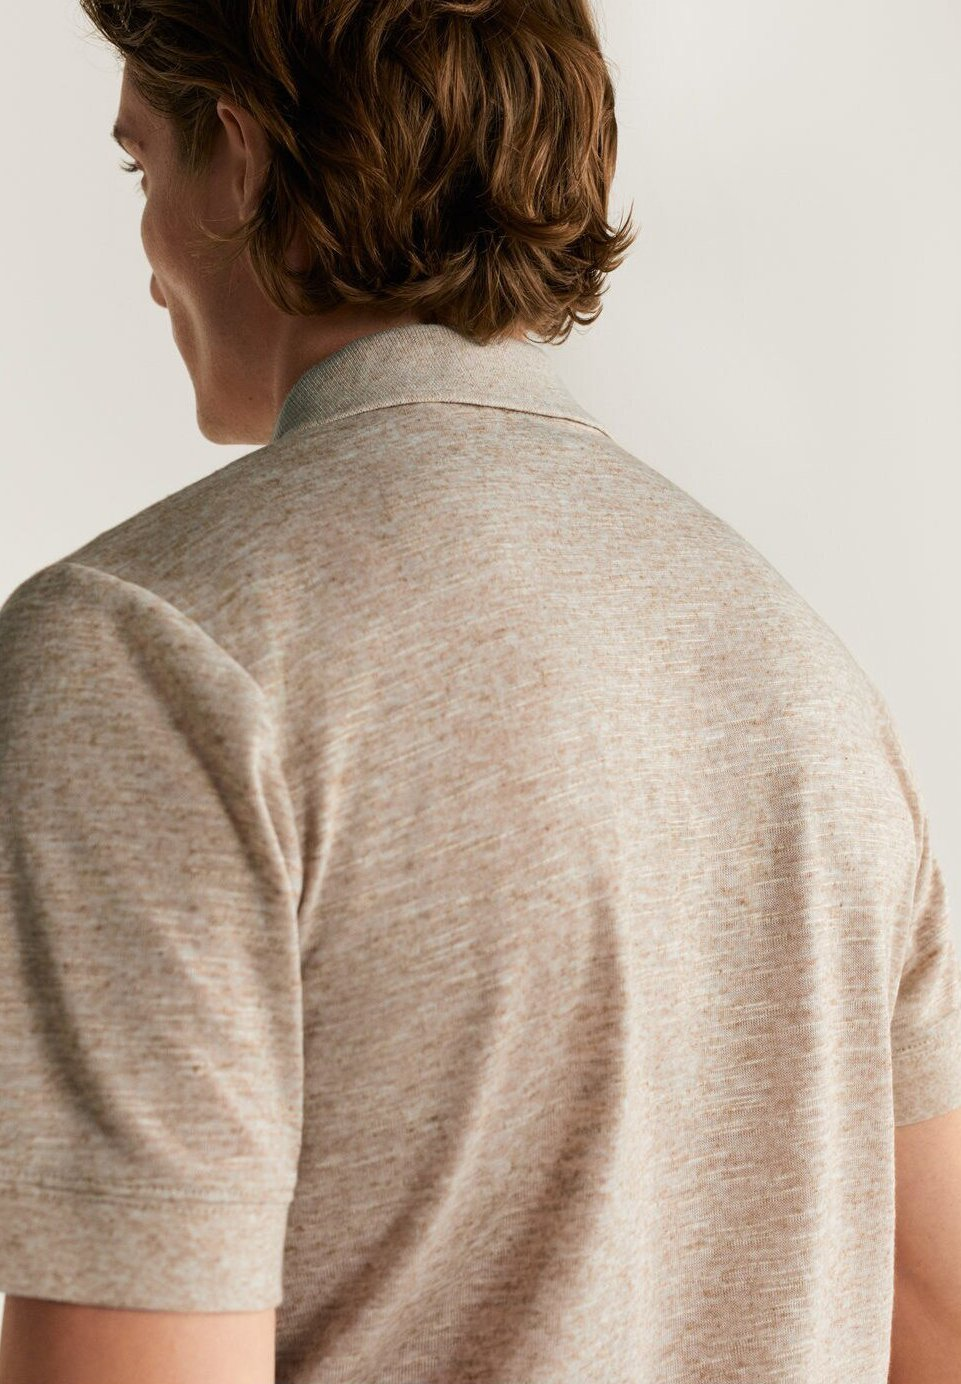 Mango Meliertes Poloshirt Aus Leinen Crochet - Sandfarben